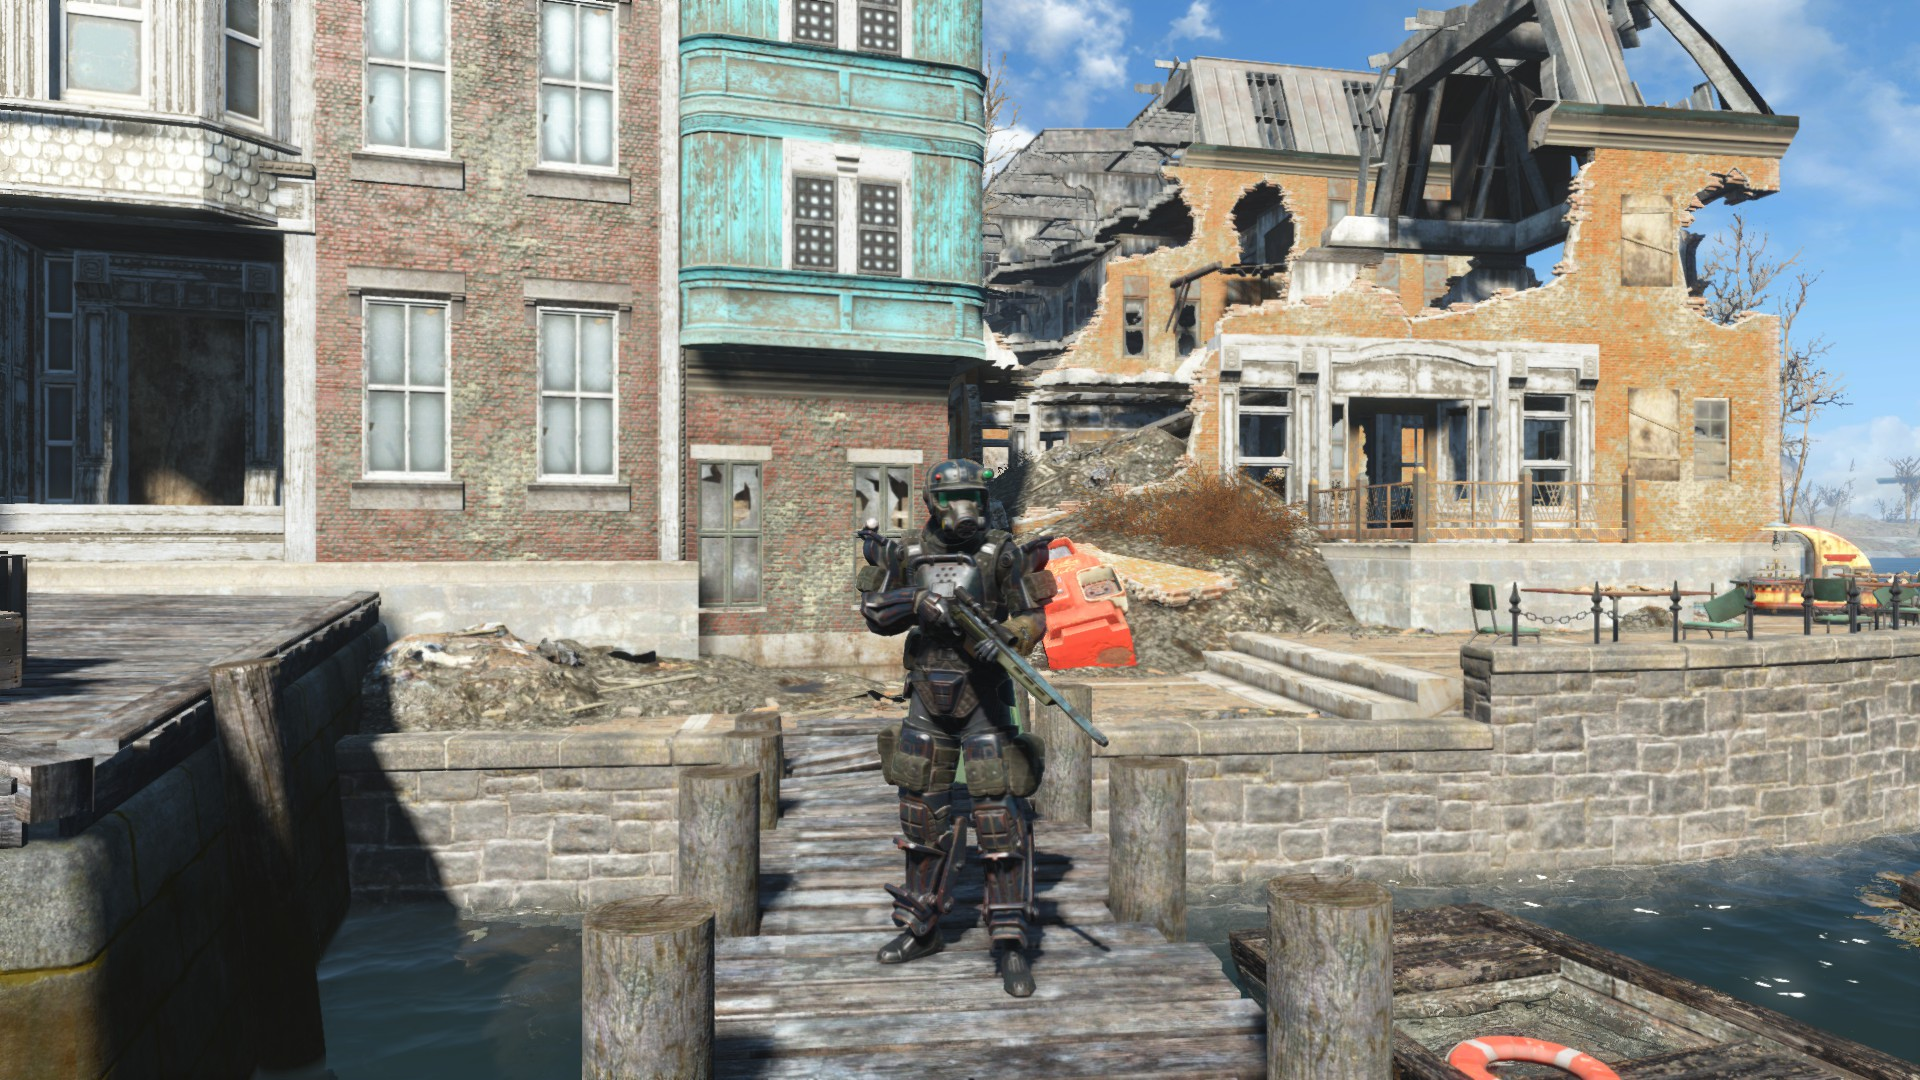 20171001123224_1.jpg - Fallout 4